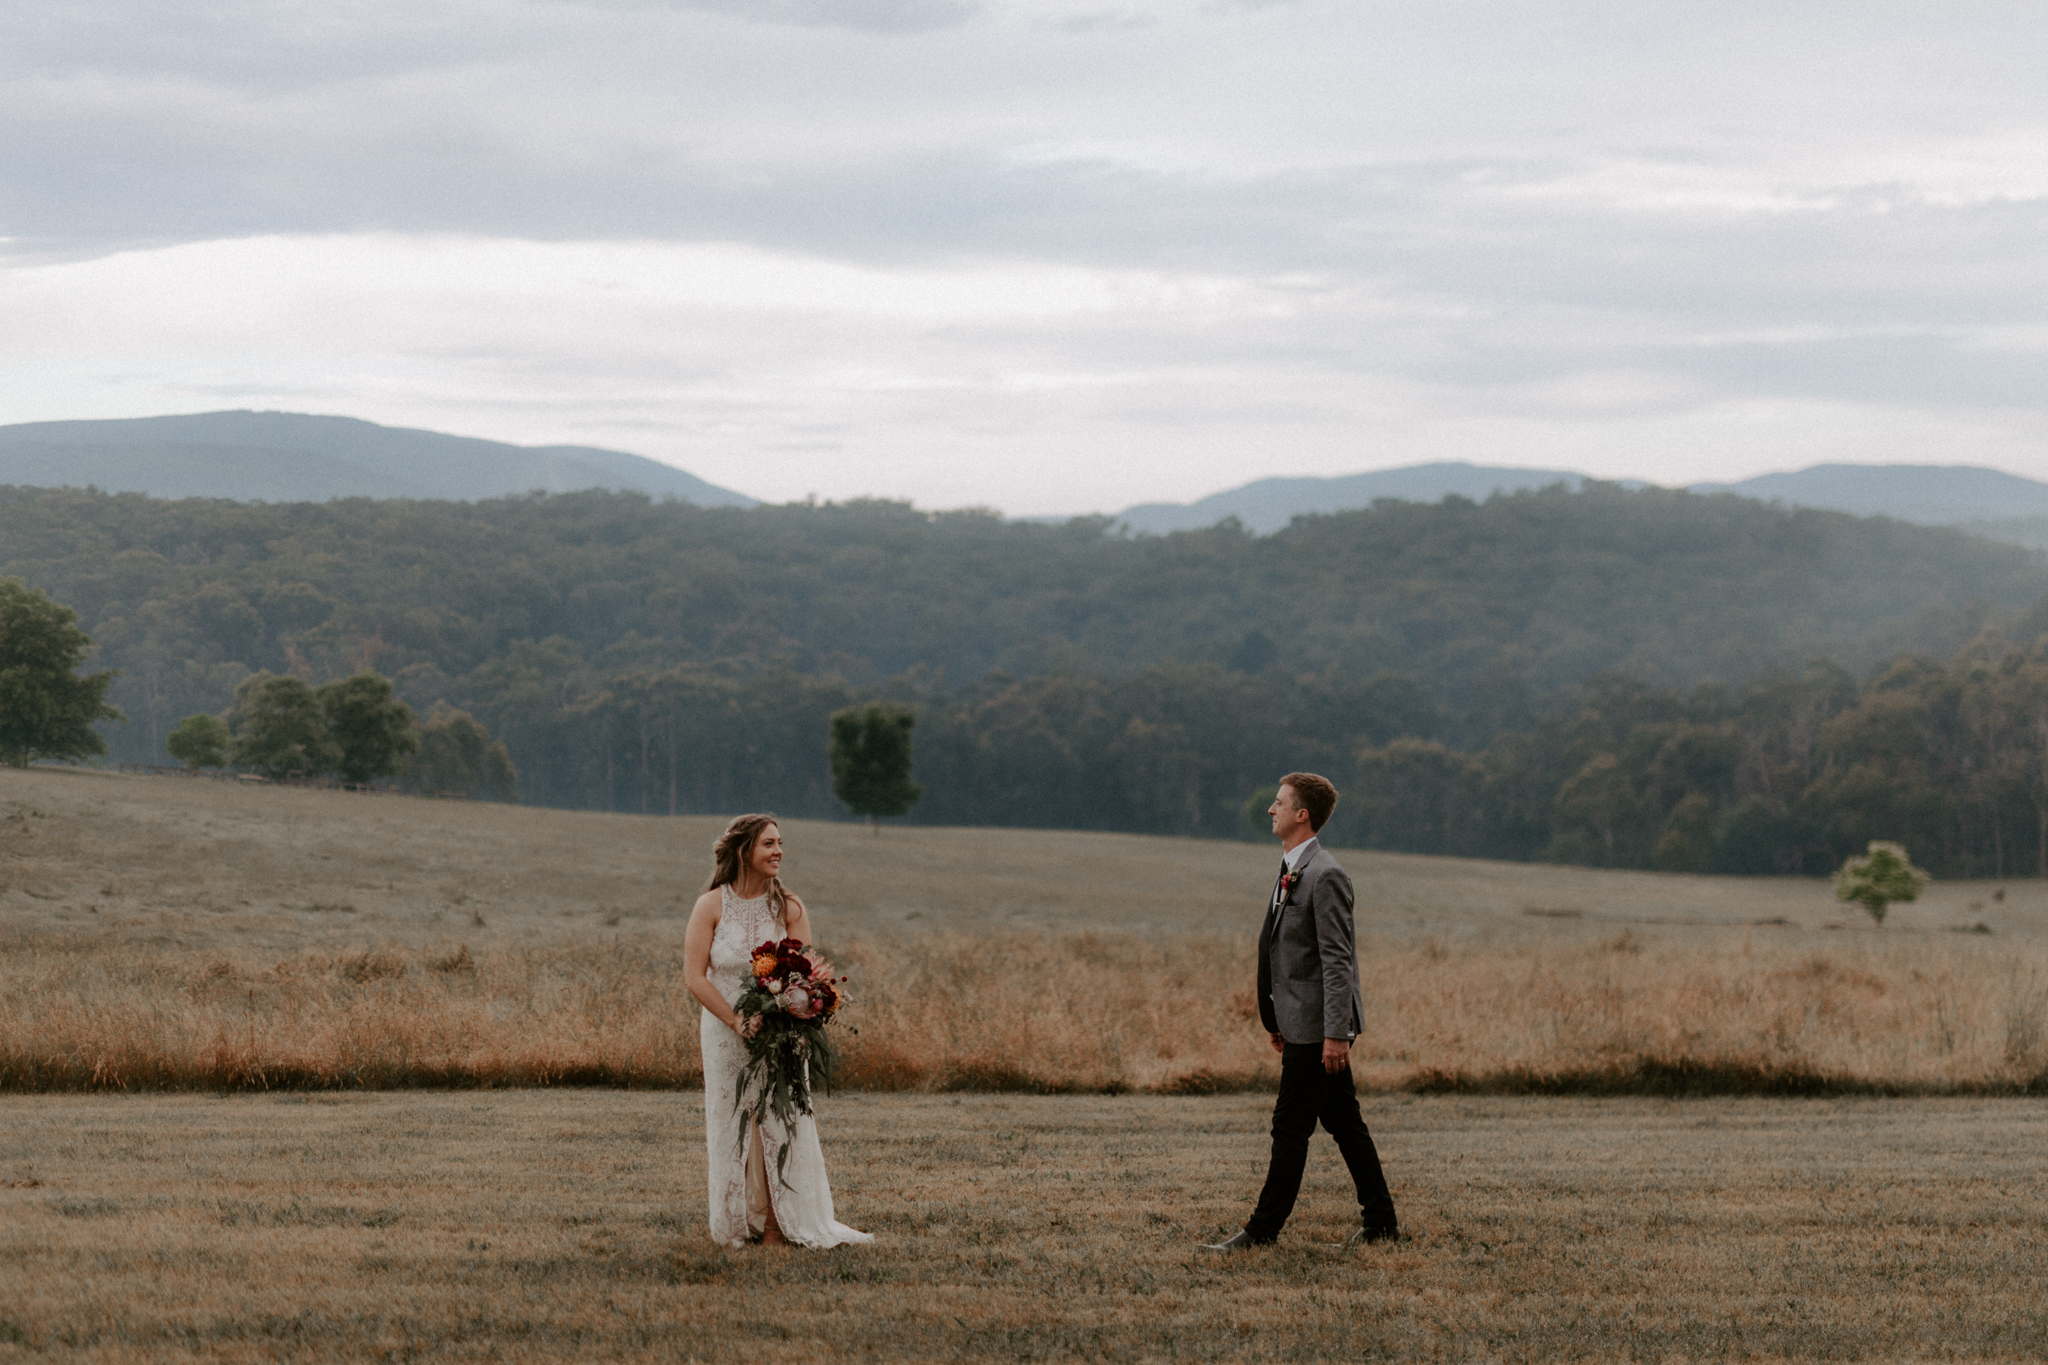 Wandin-Park-Estate-Wedding-Emotions-and-Math-Photography-154.jpg